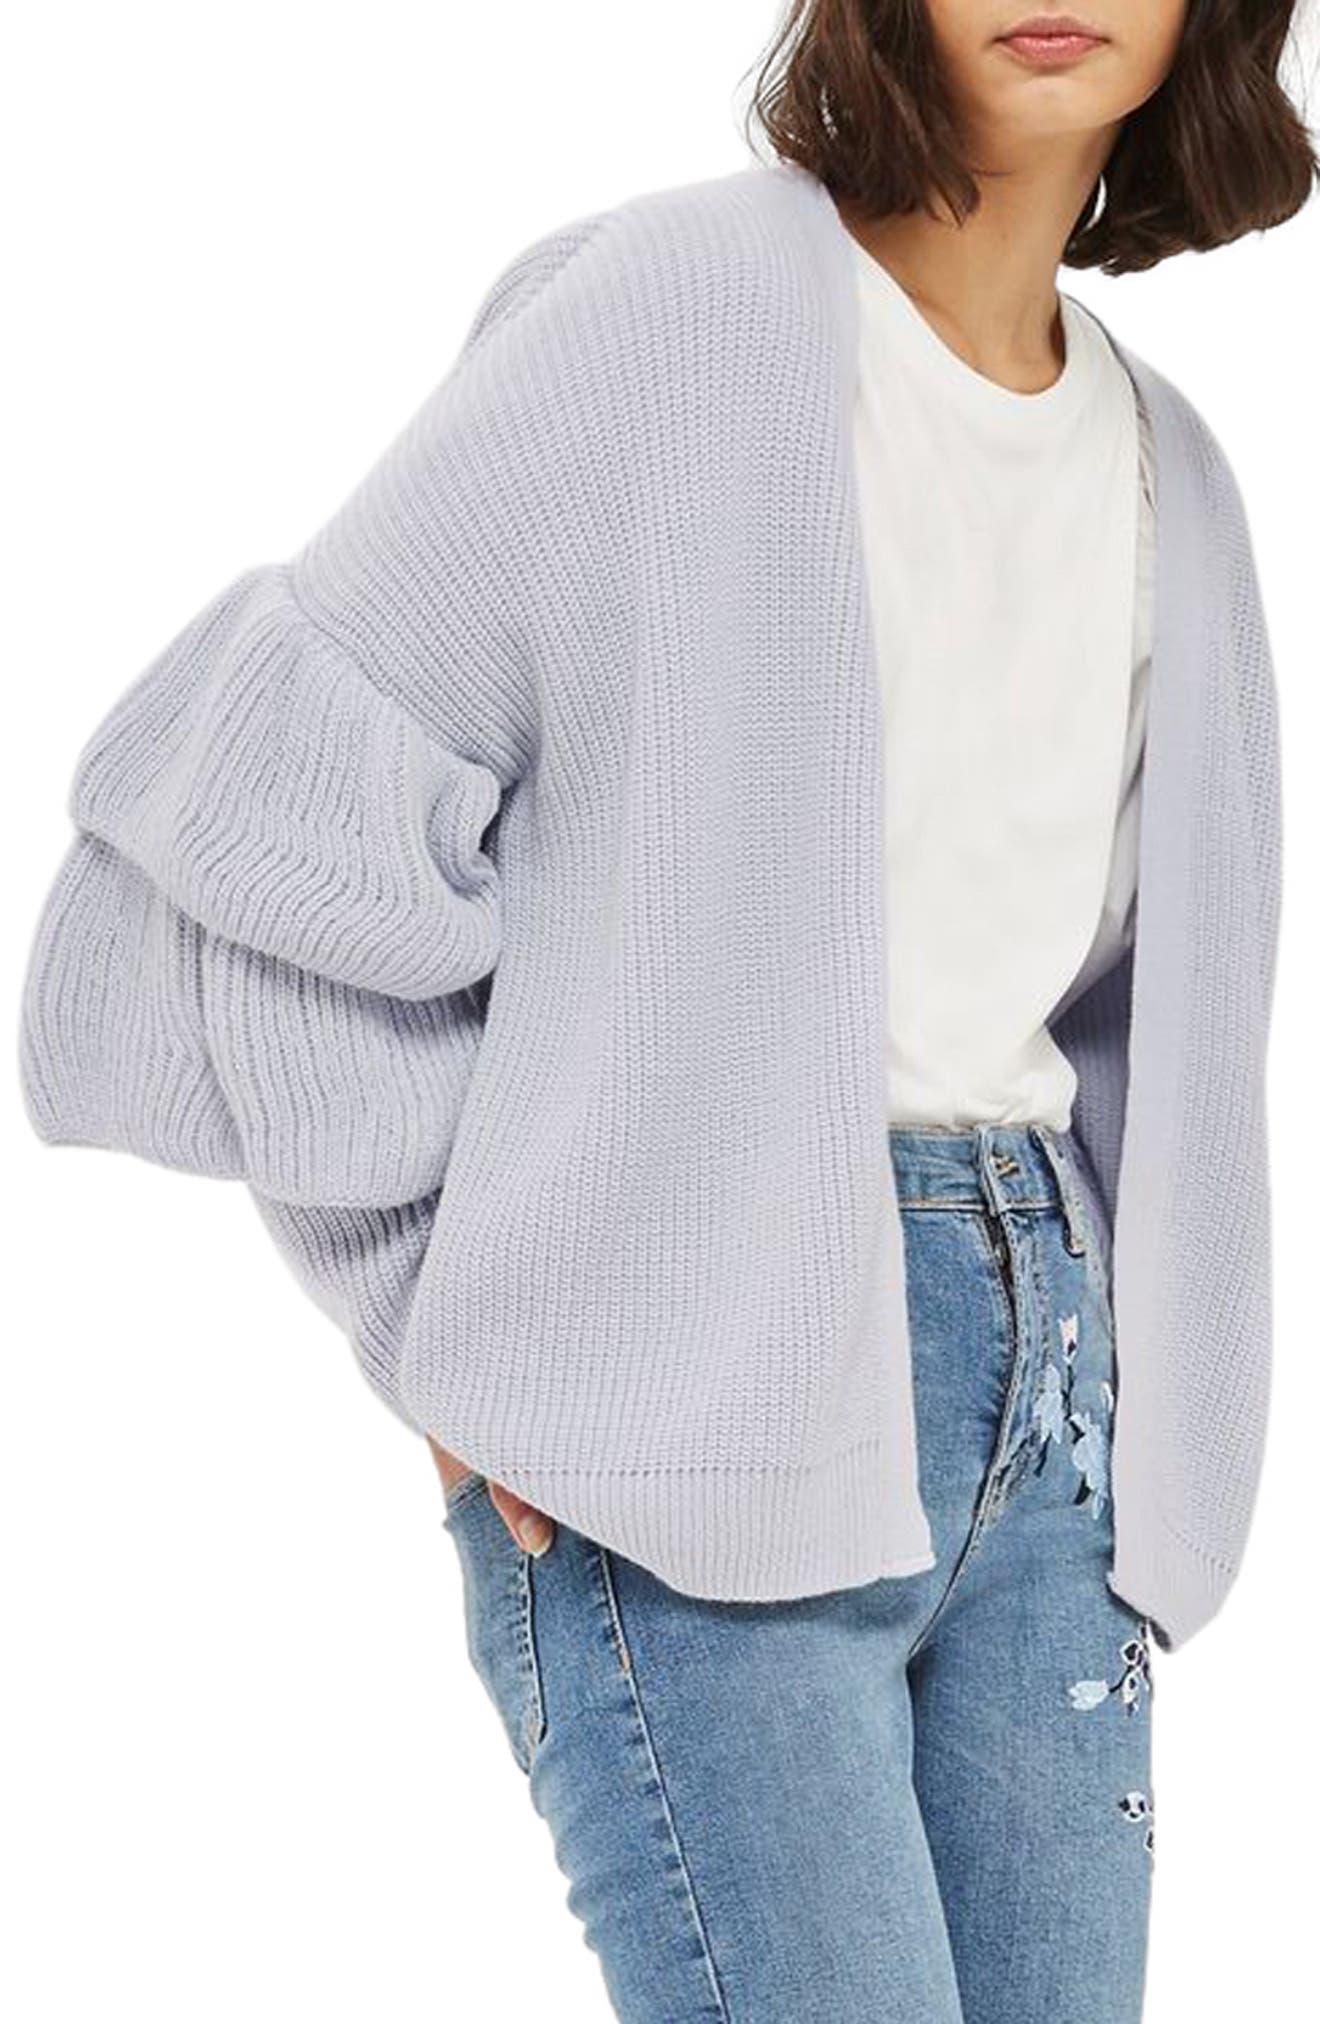 Alternate Image 1 Selected - Topshop Layered Ruffle Sleeve Cardigan